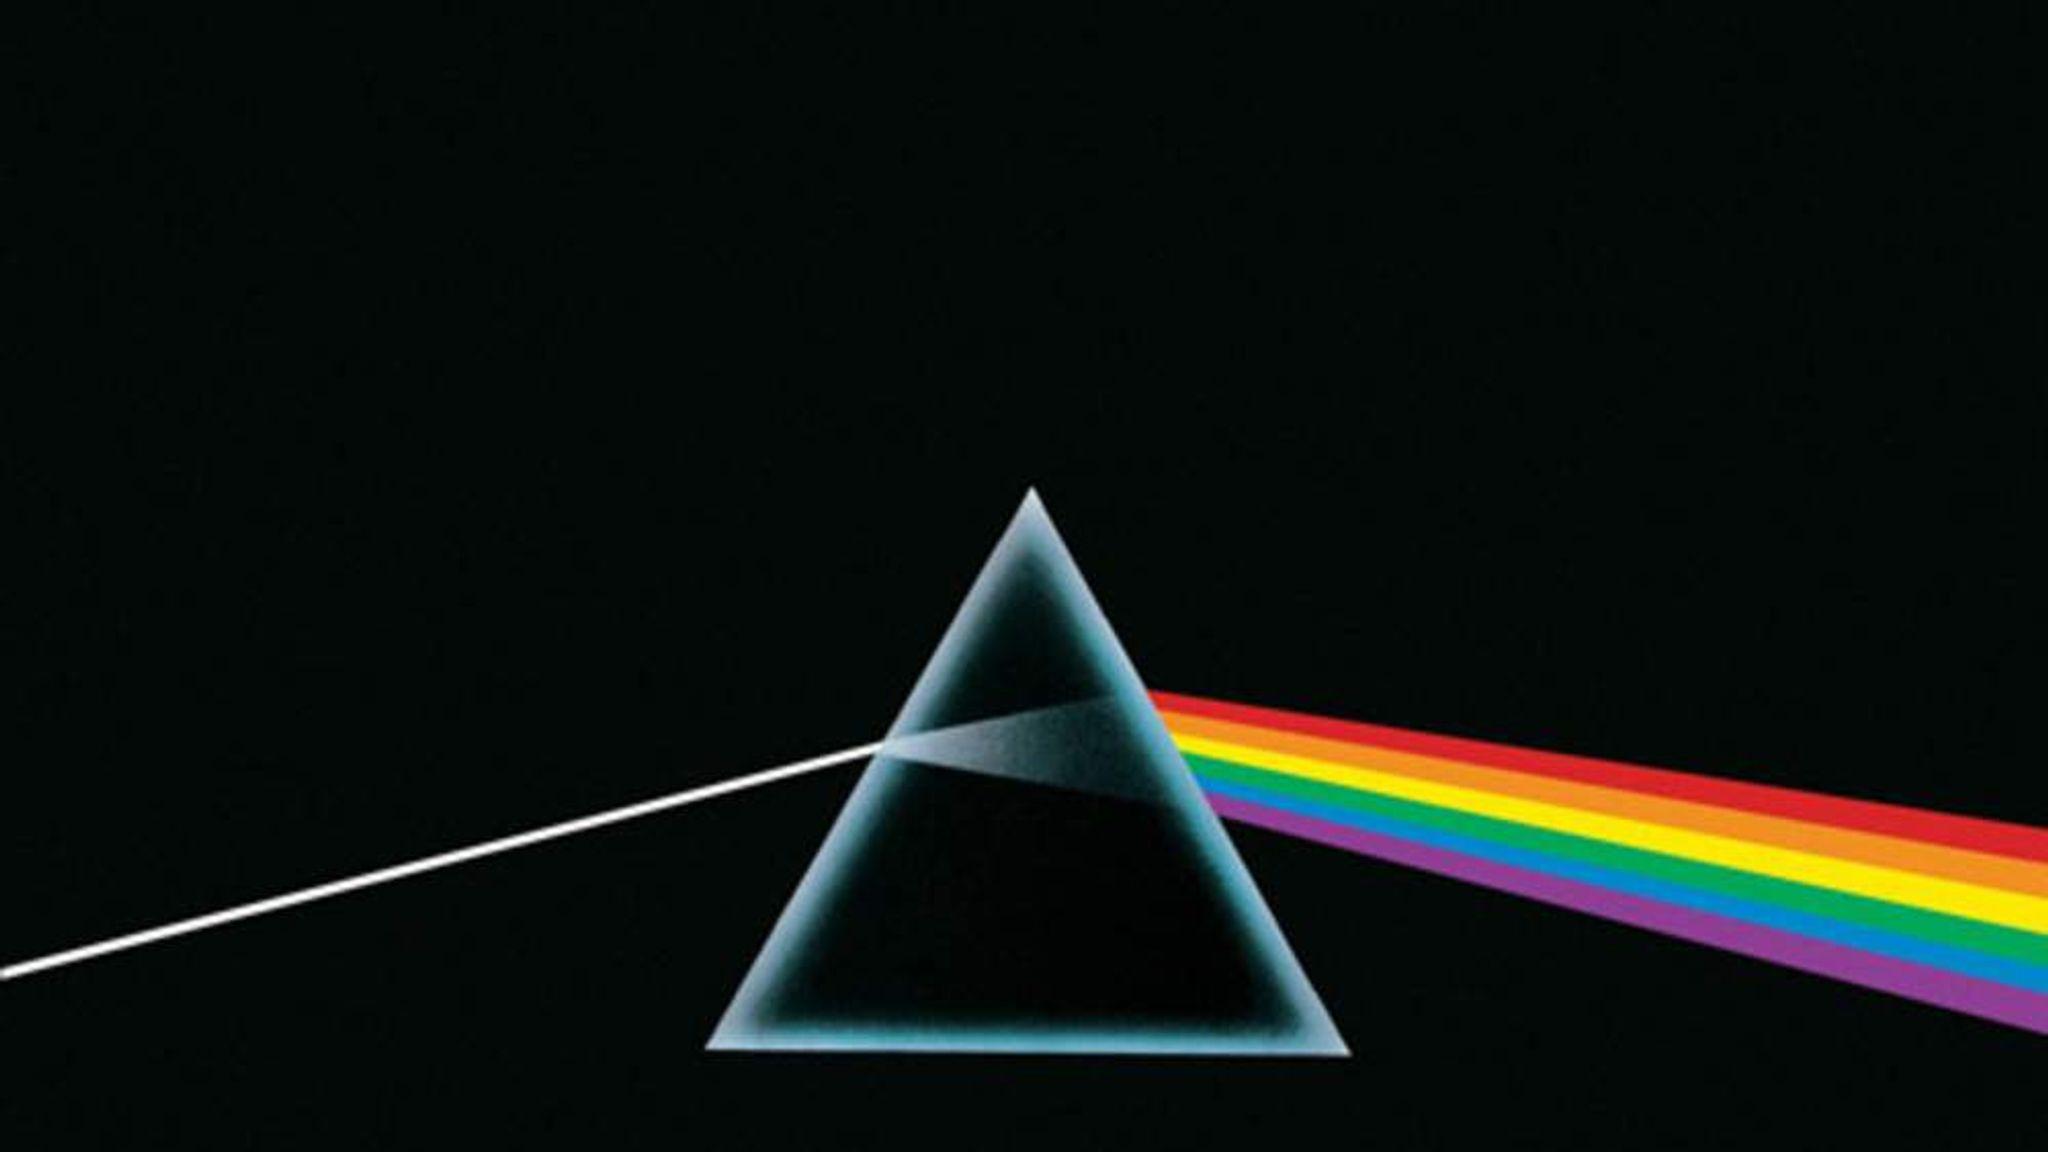 Storm Thorgerson Pink Floyd Artist Dies Ents Arts News Sky News